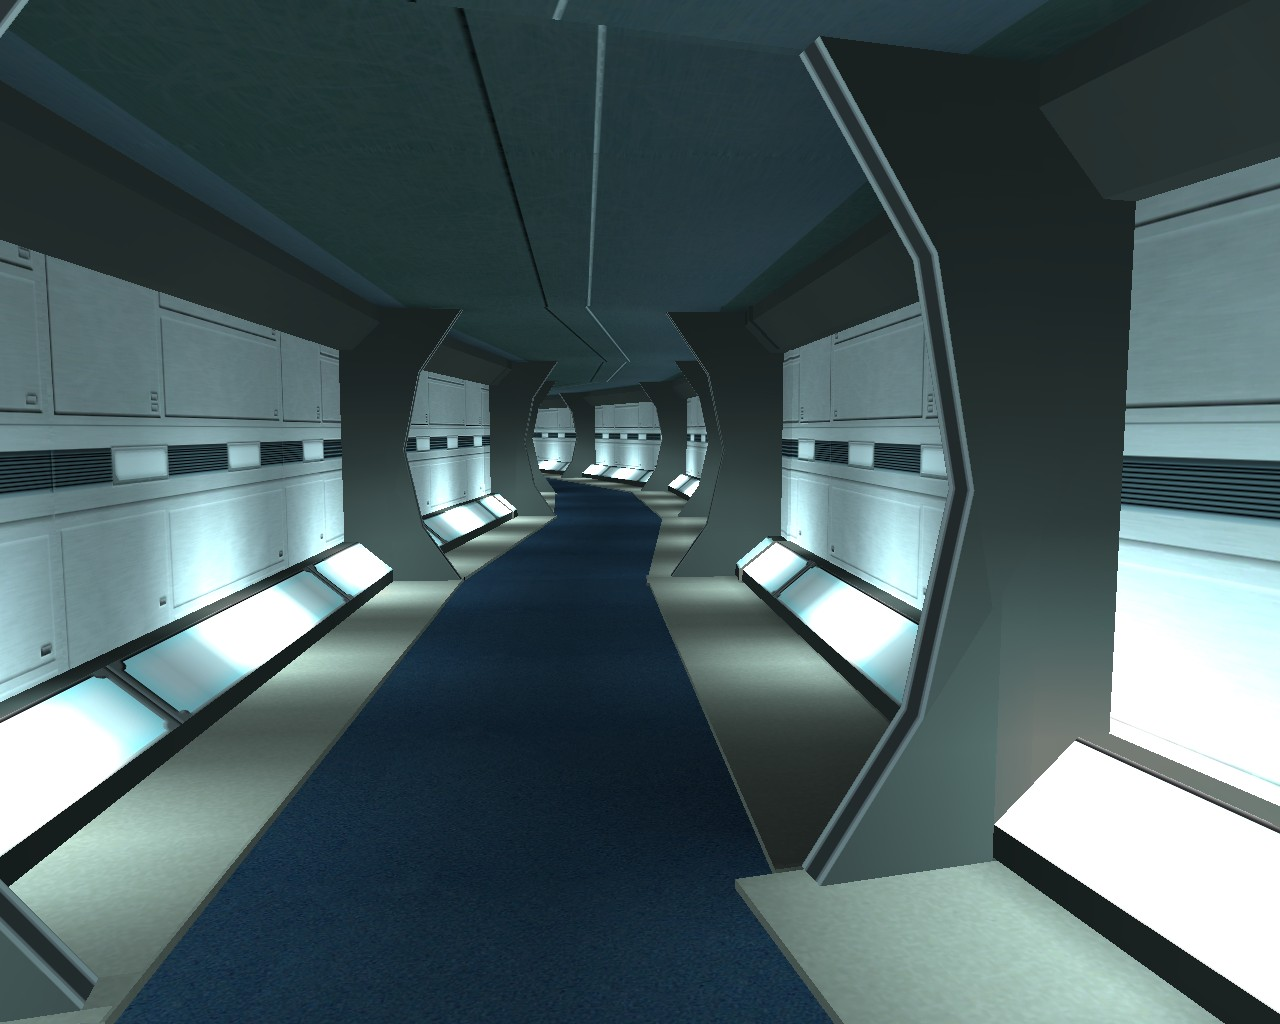 Rigel VII: TNG Corridors |Uss Enterprise Corridors